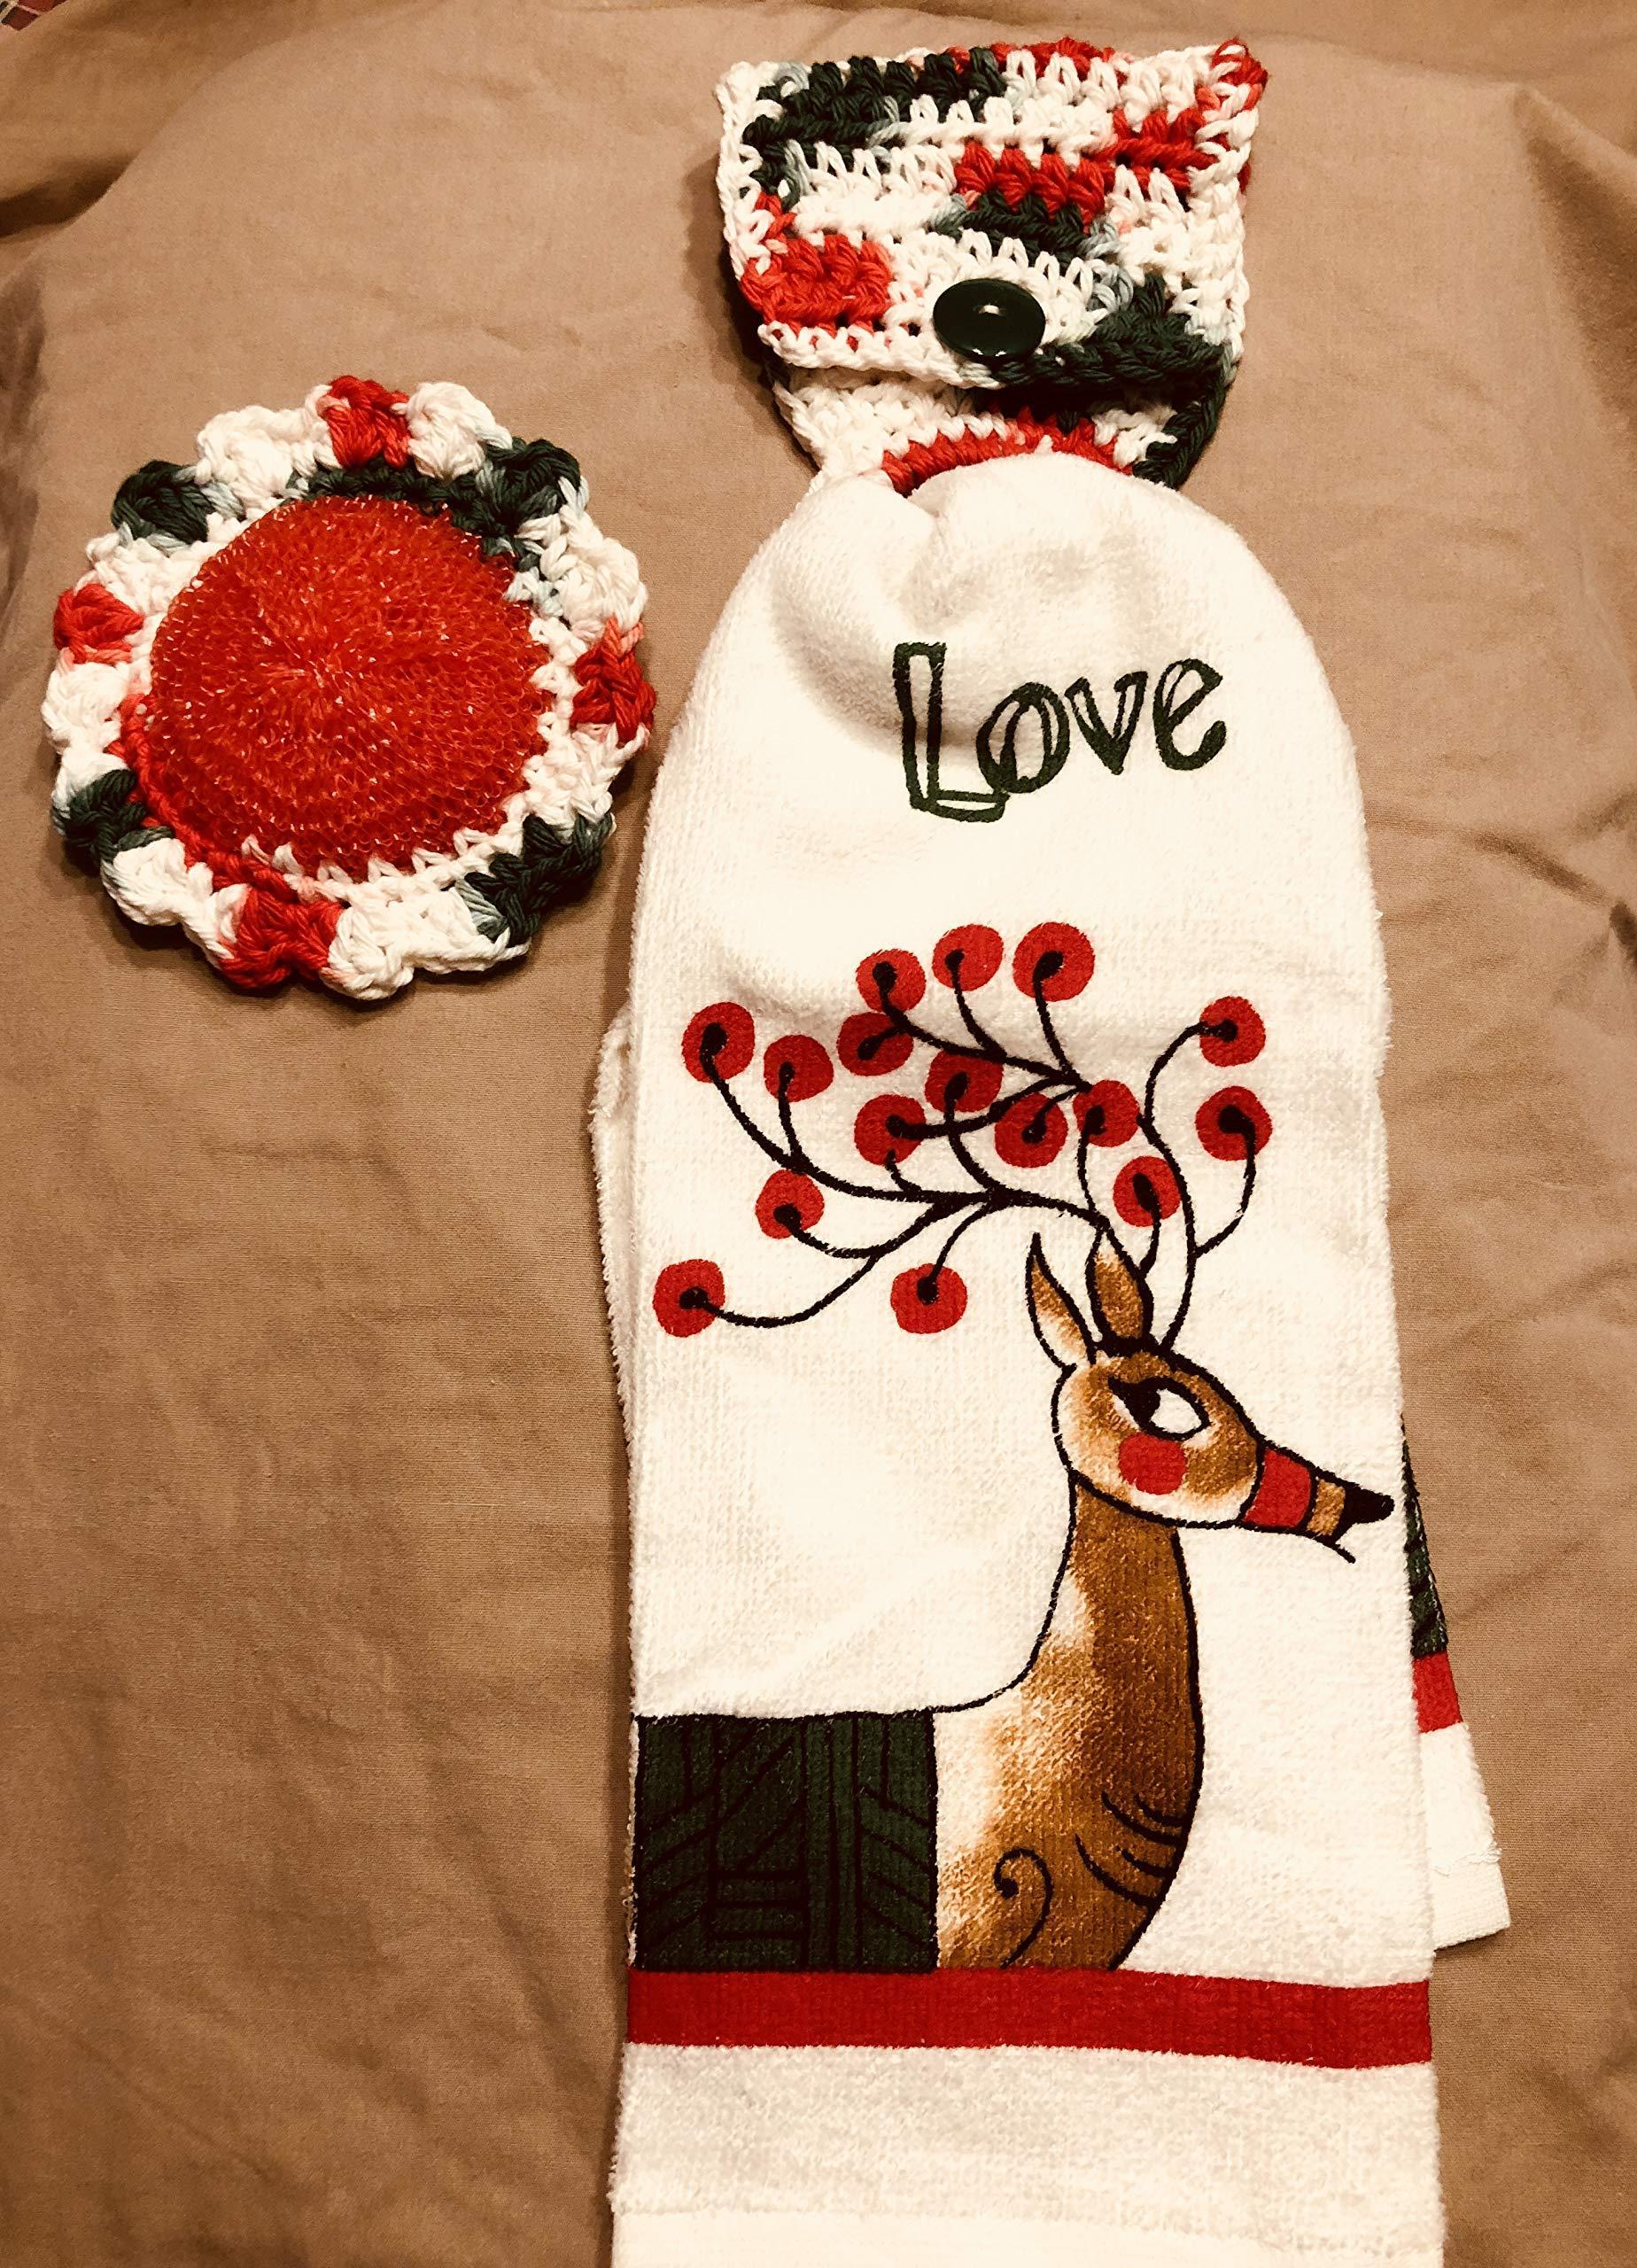 Free ship to USA - 3 piece set - Christmas Love Reindeer 1 CROCHET Plastic Scrubber, Towel holder & KITCHEN hand TOWEL light weight terry cloth - 100% cotton yarn